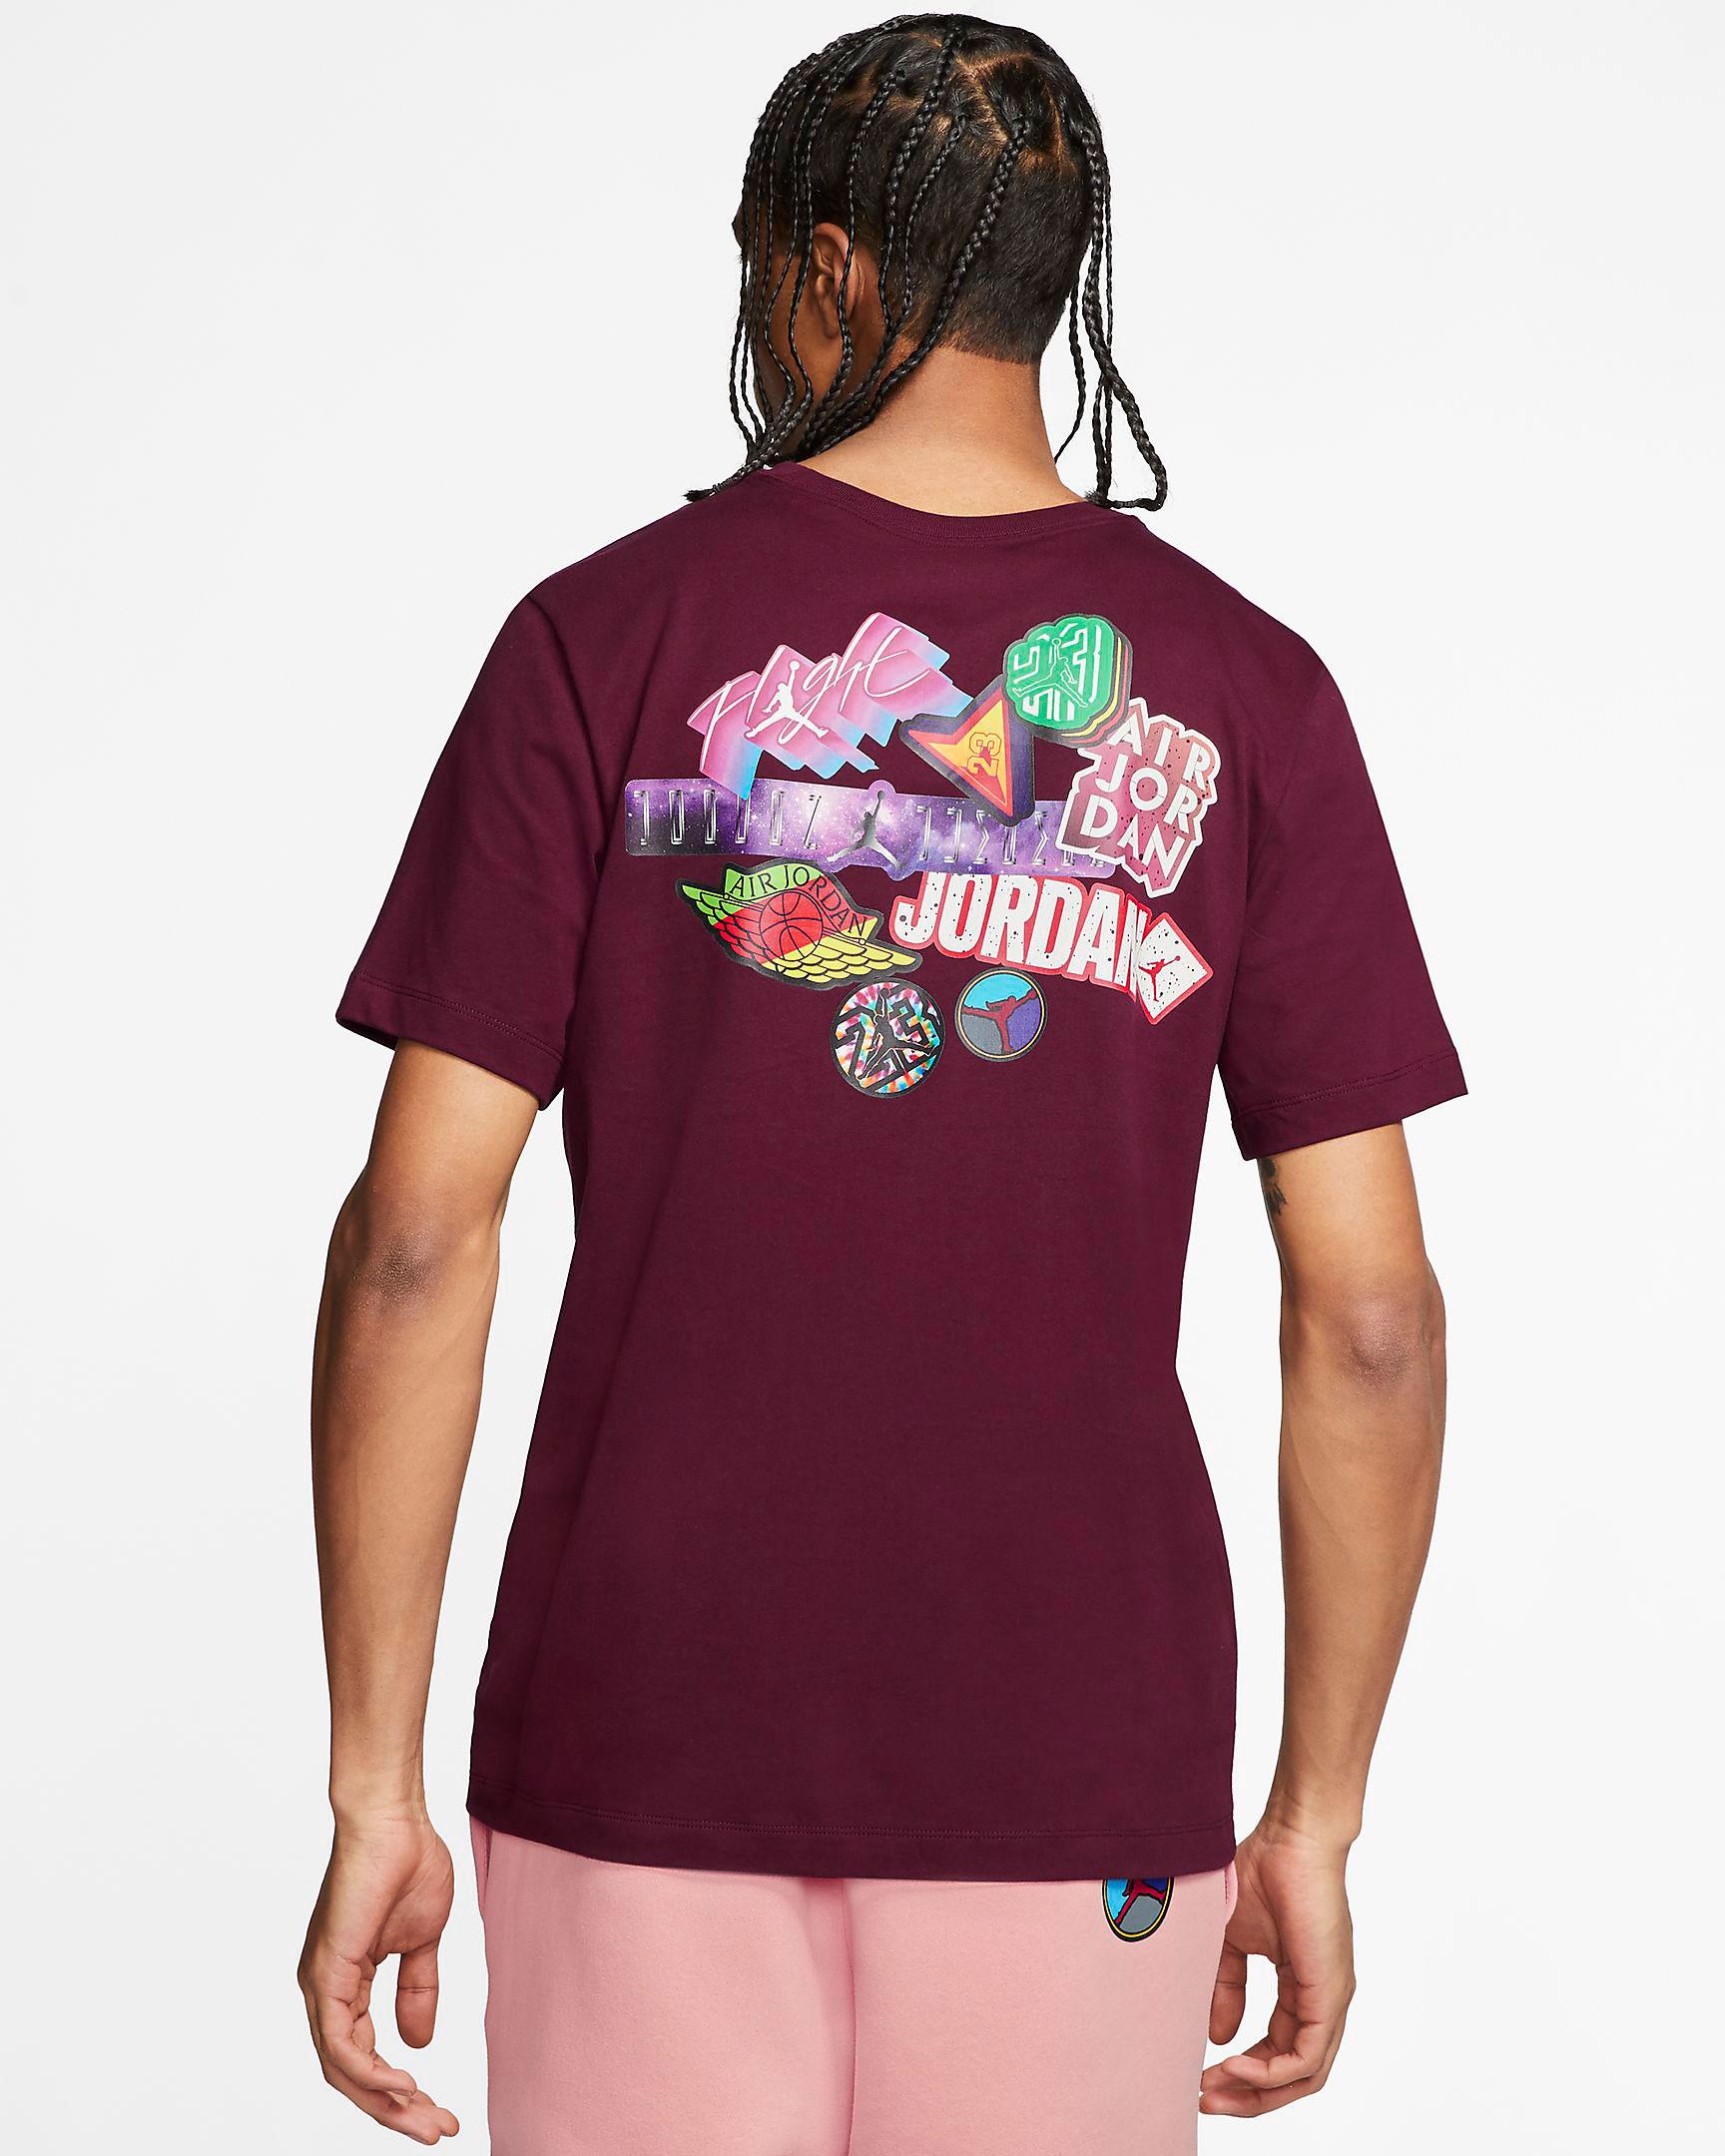 jordan-sticker-shirt-burgundy-2